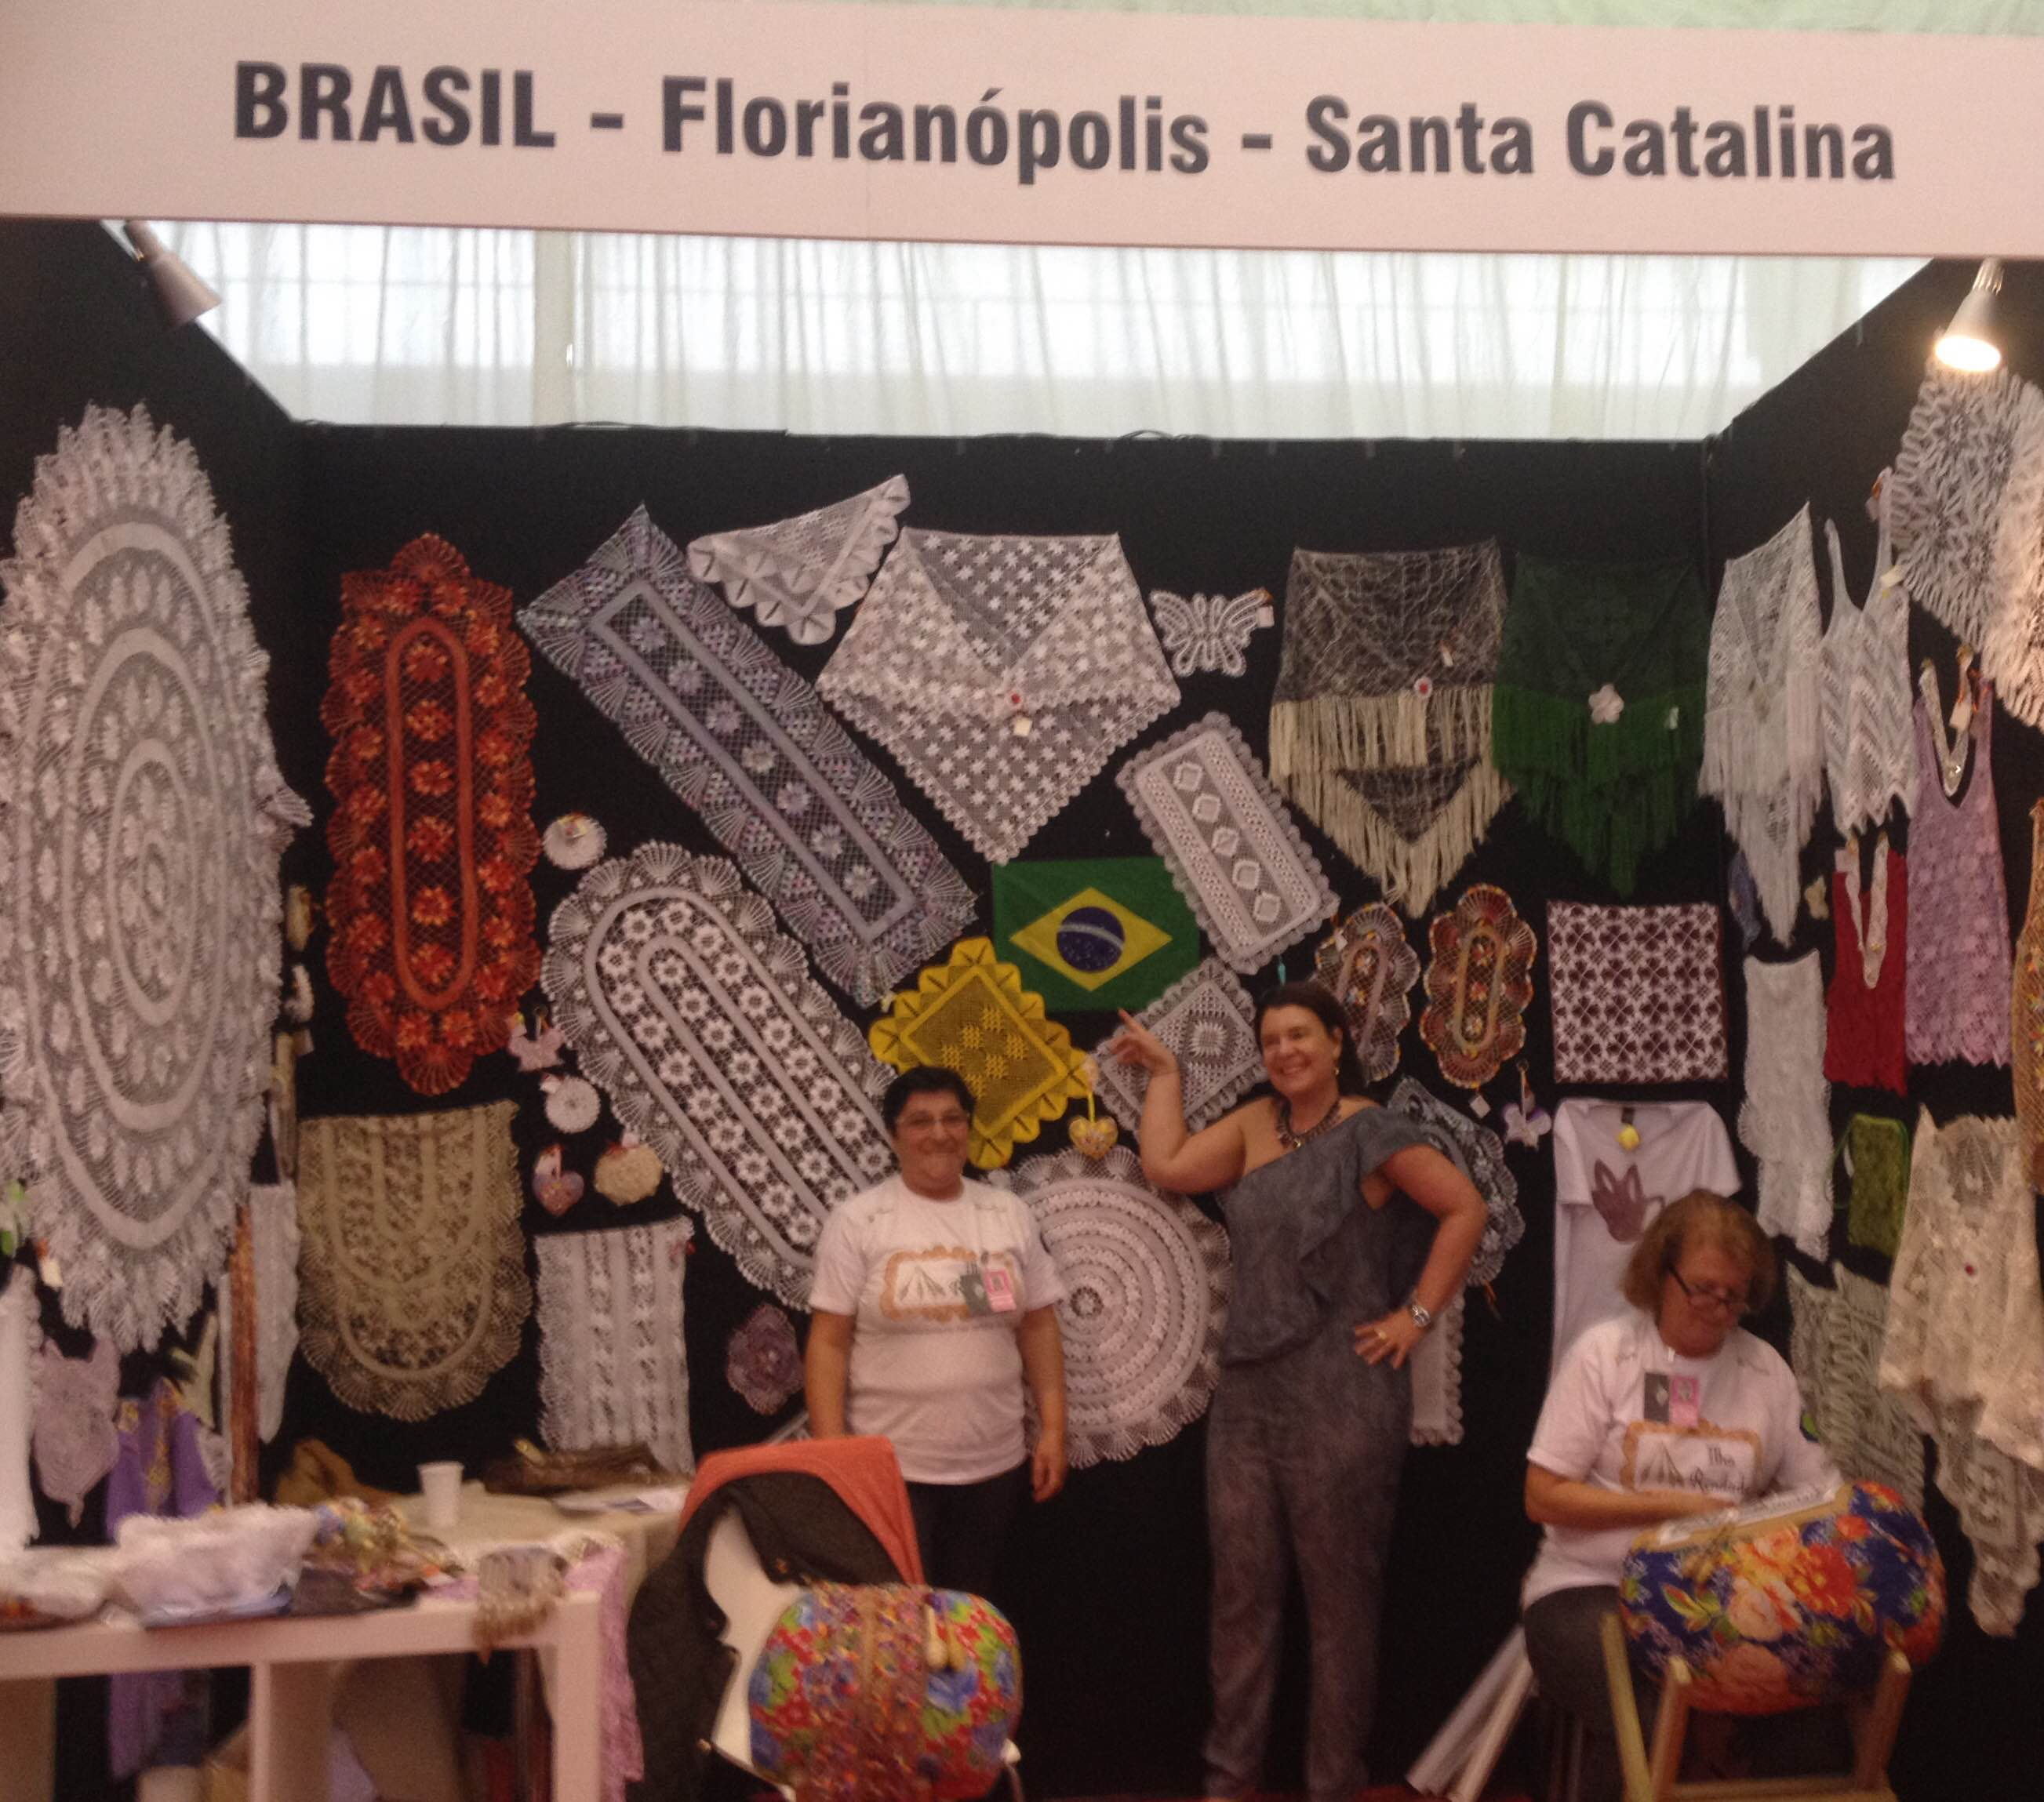 Renata Pessanha de Menezes en el Stand de Brasil